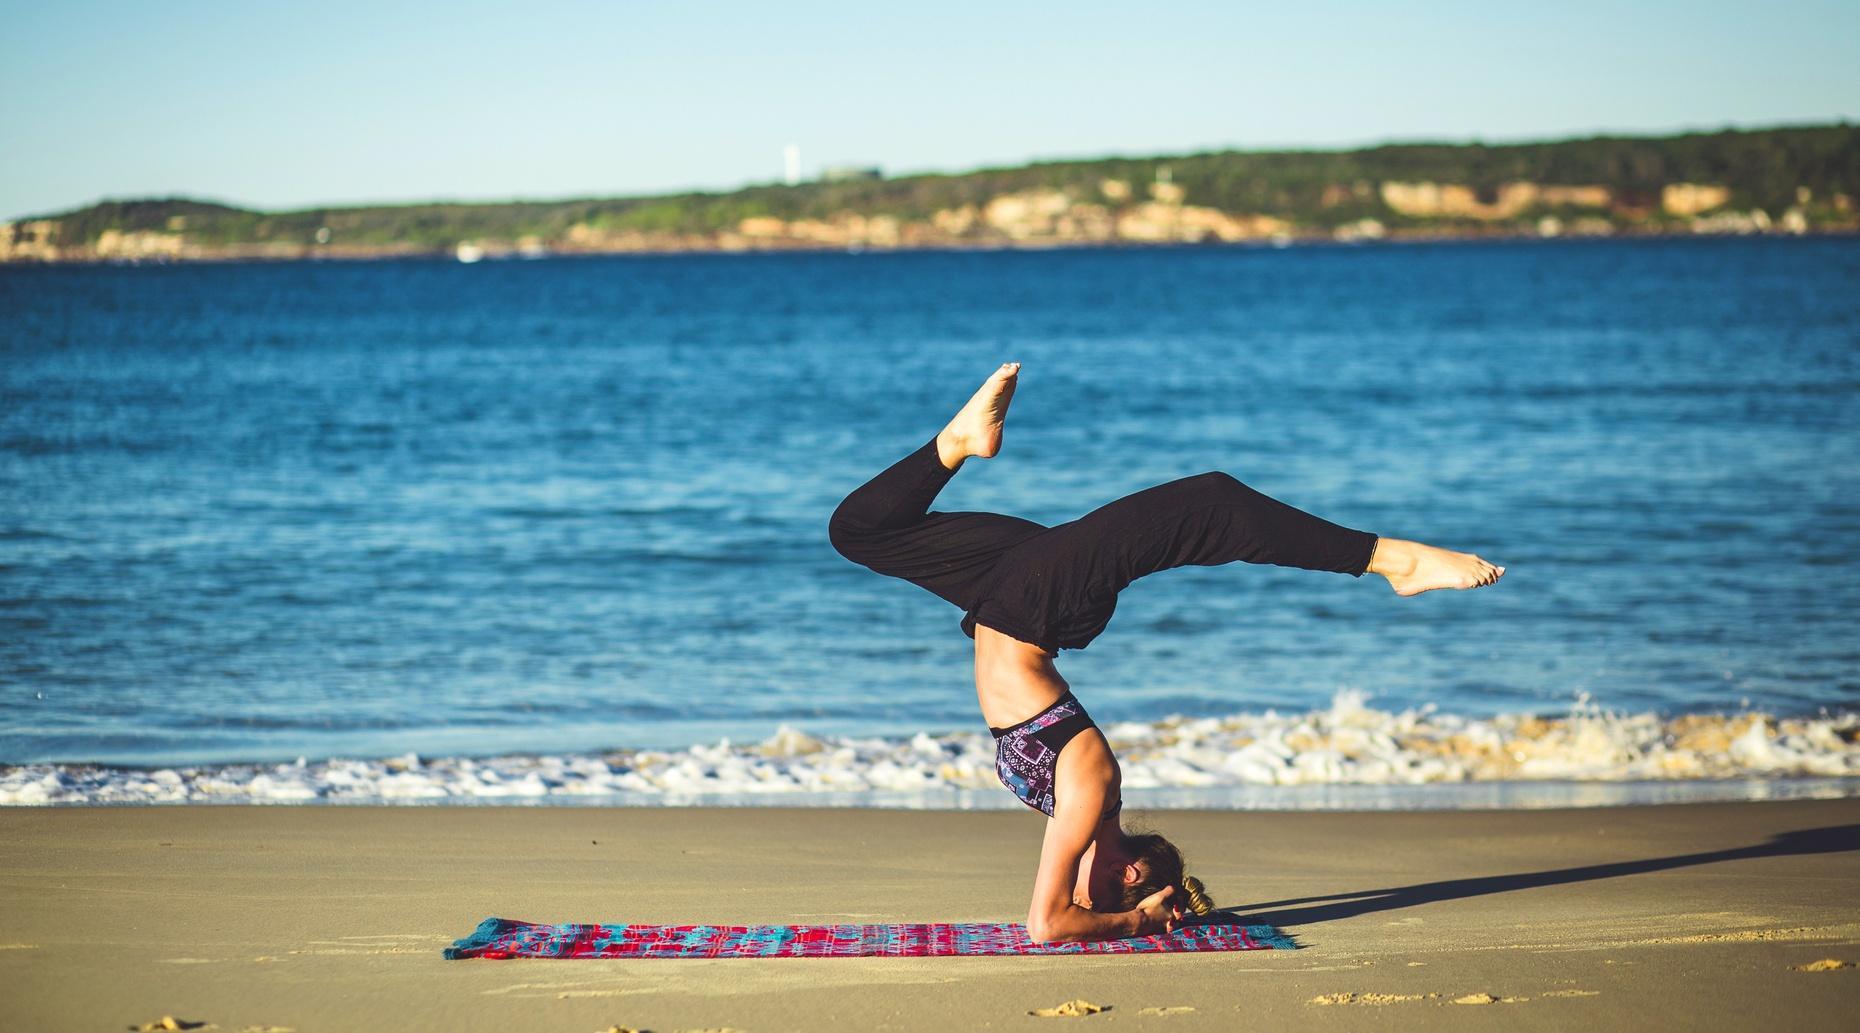 Hourlong Yoga Cruise on Lake Hopatcong